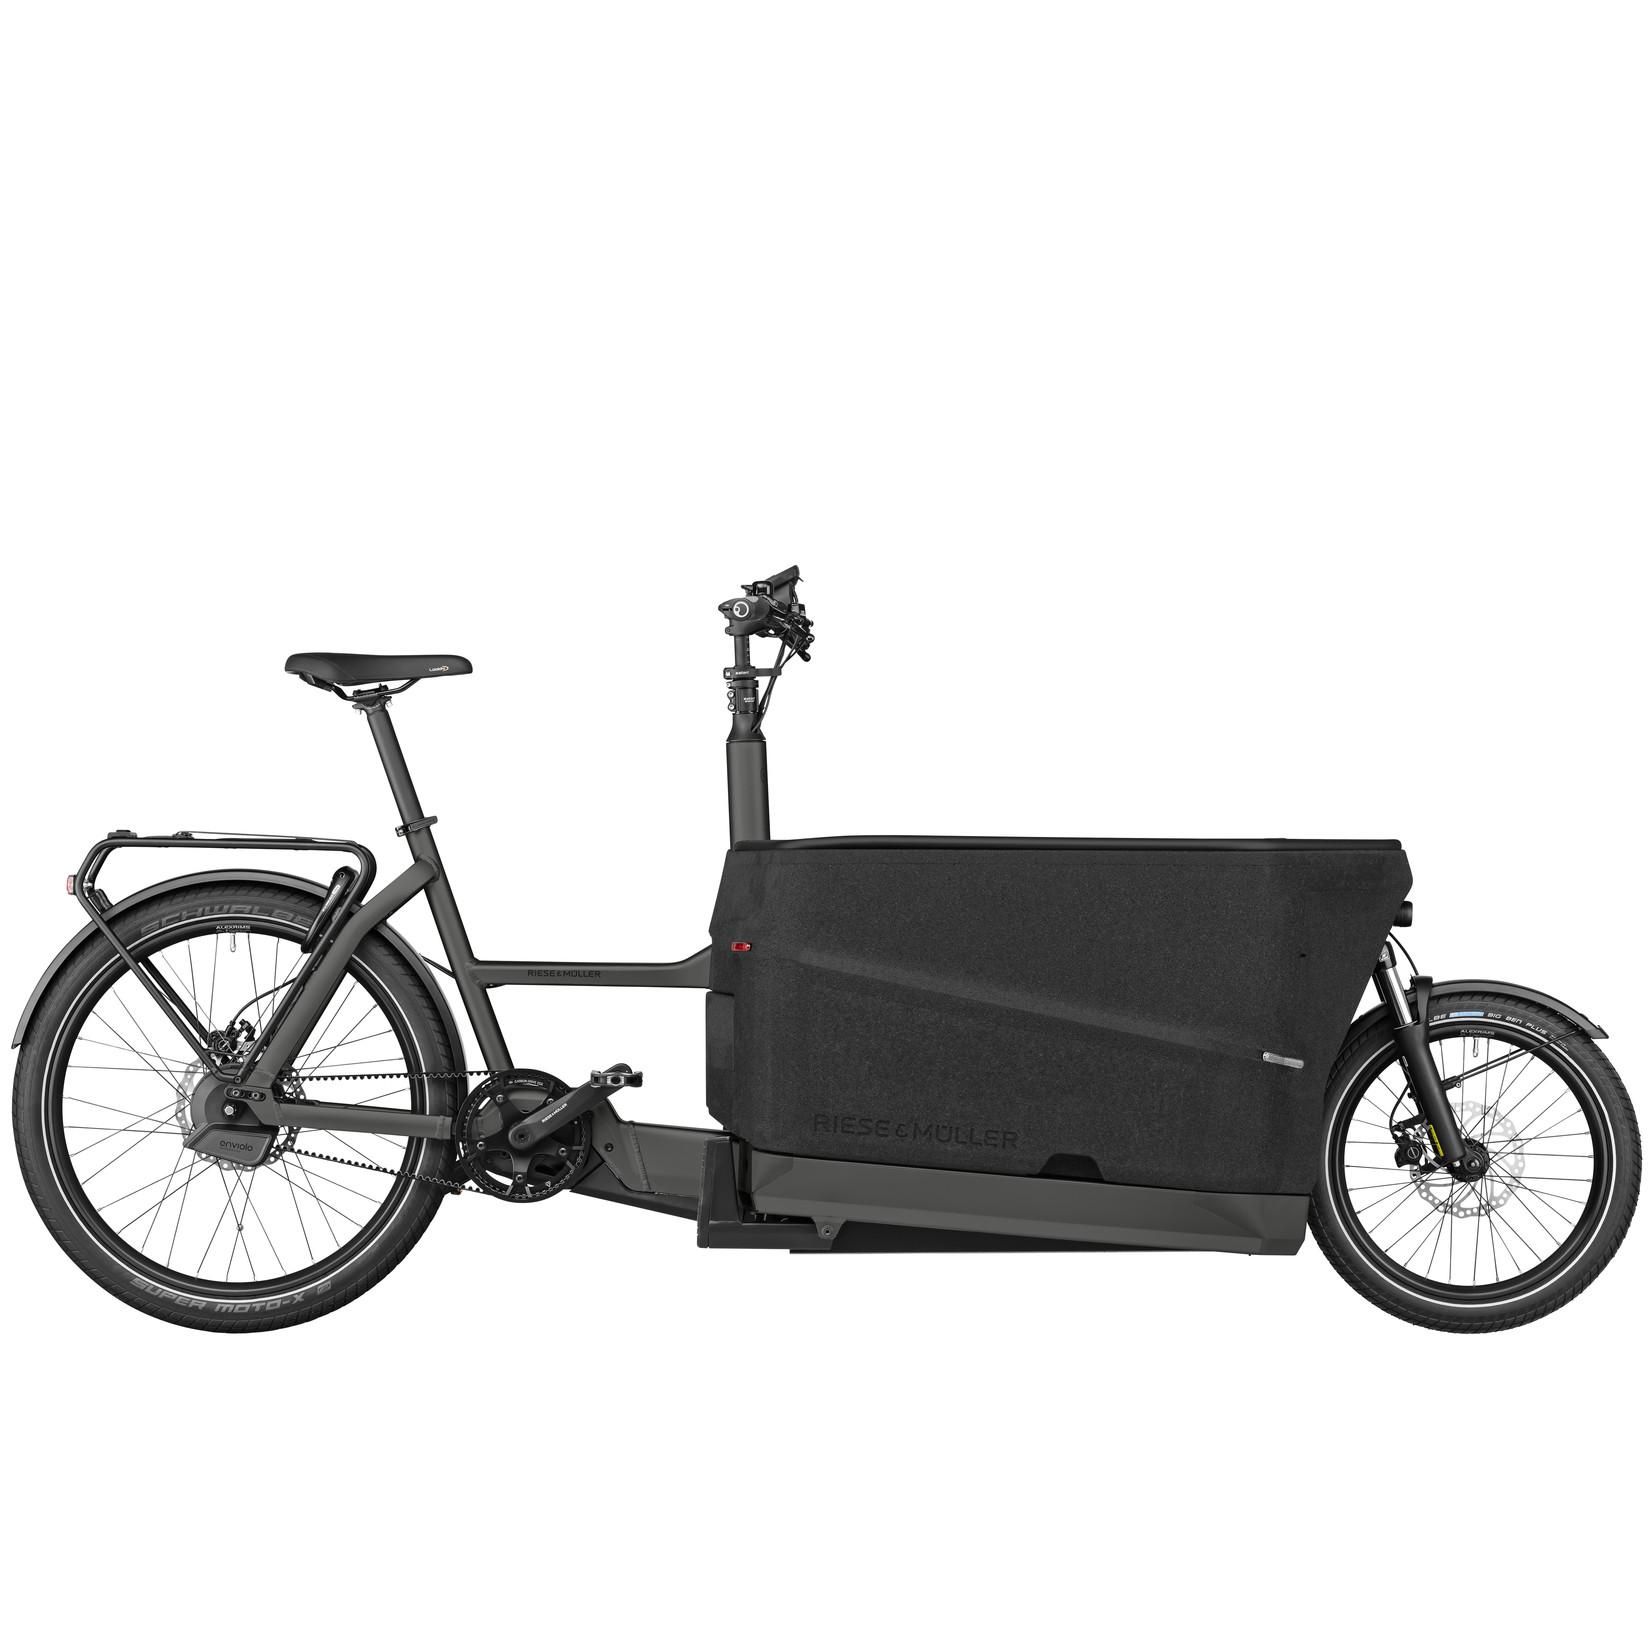 Riese & Muller Reese & Muller, Packster 70 Automatic, Urban Grey Matt